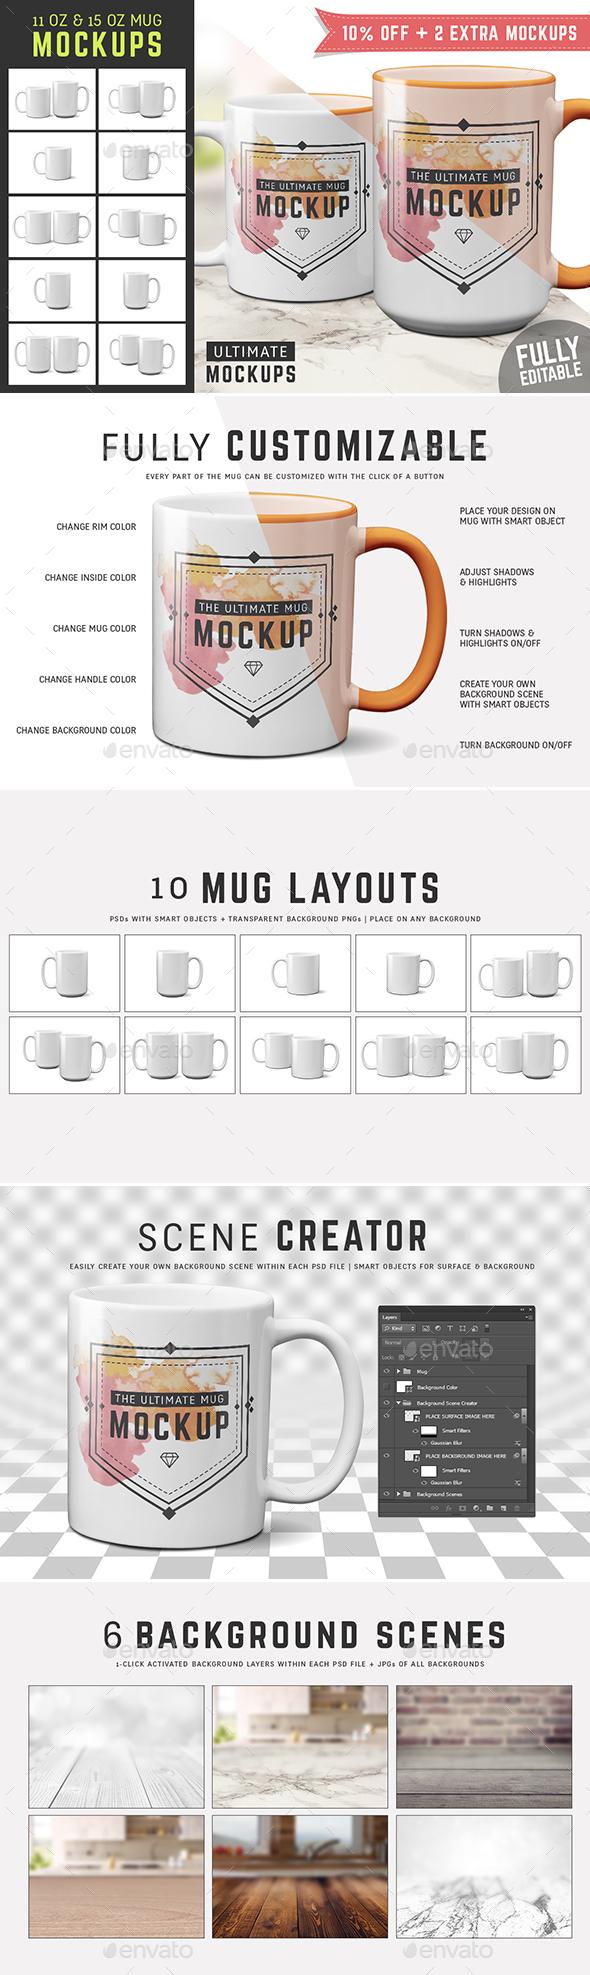 11 oz & 15 oz Mug Mockup Templates - Food and Drink Packaging